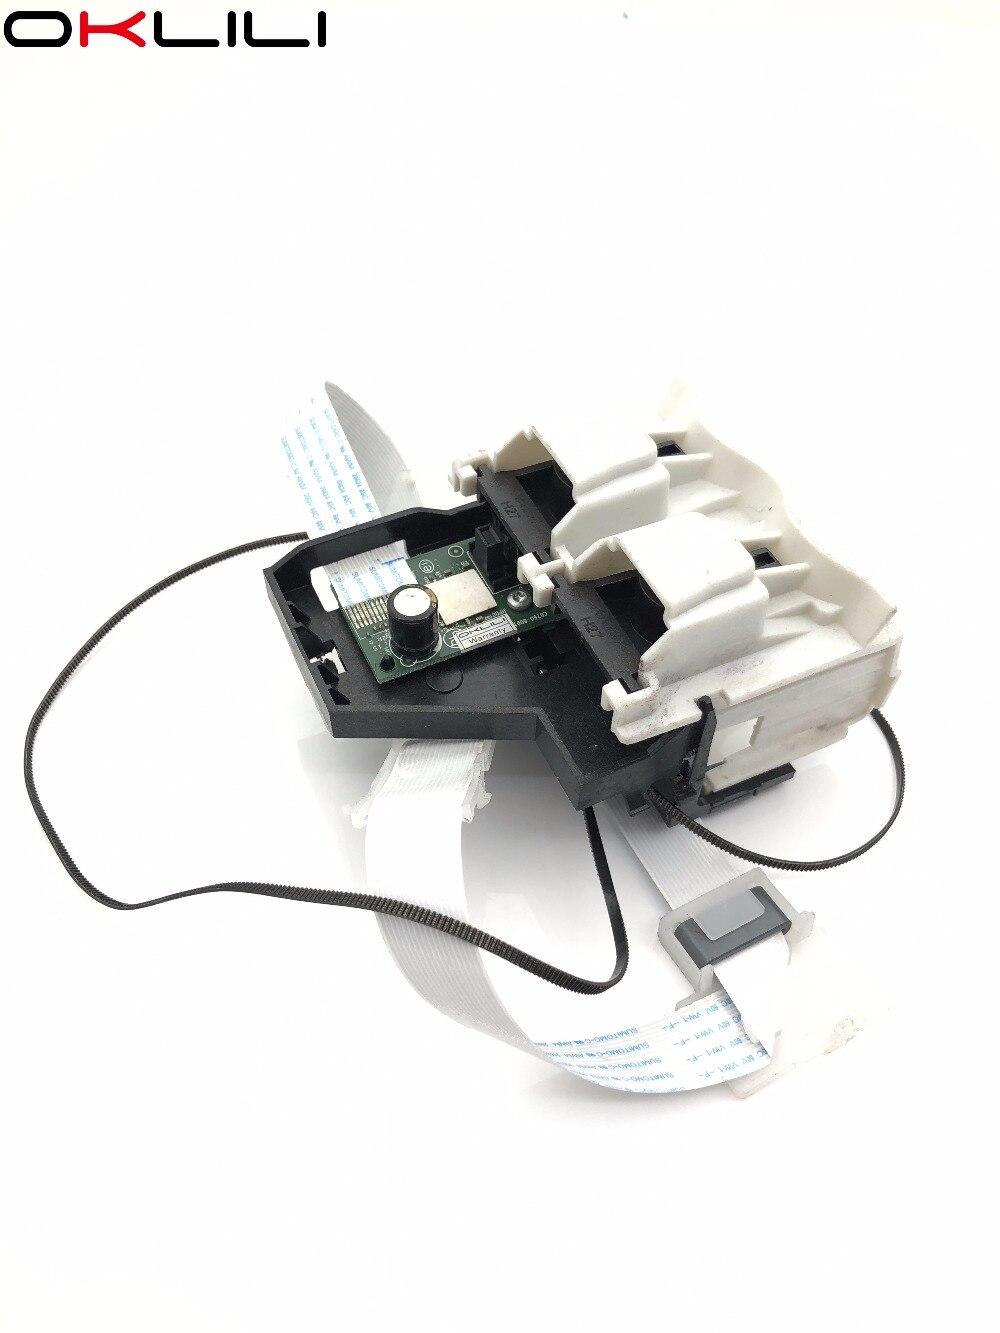 все цены на 802 802XL Carriage Unit Assembly ASSY for HP DeskJet 1000 1010 1050 1051 1055 1510 1512 2000 2010 2050 2060 2510 2540 3000 3050 онлайн